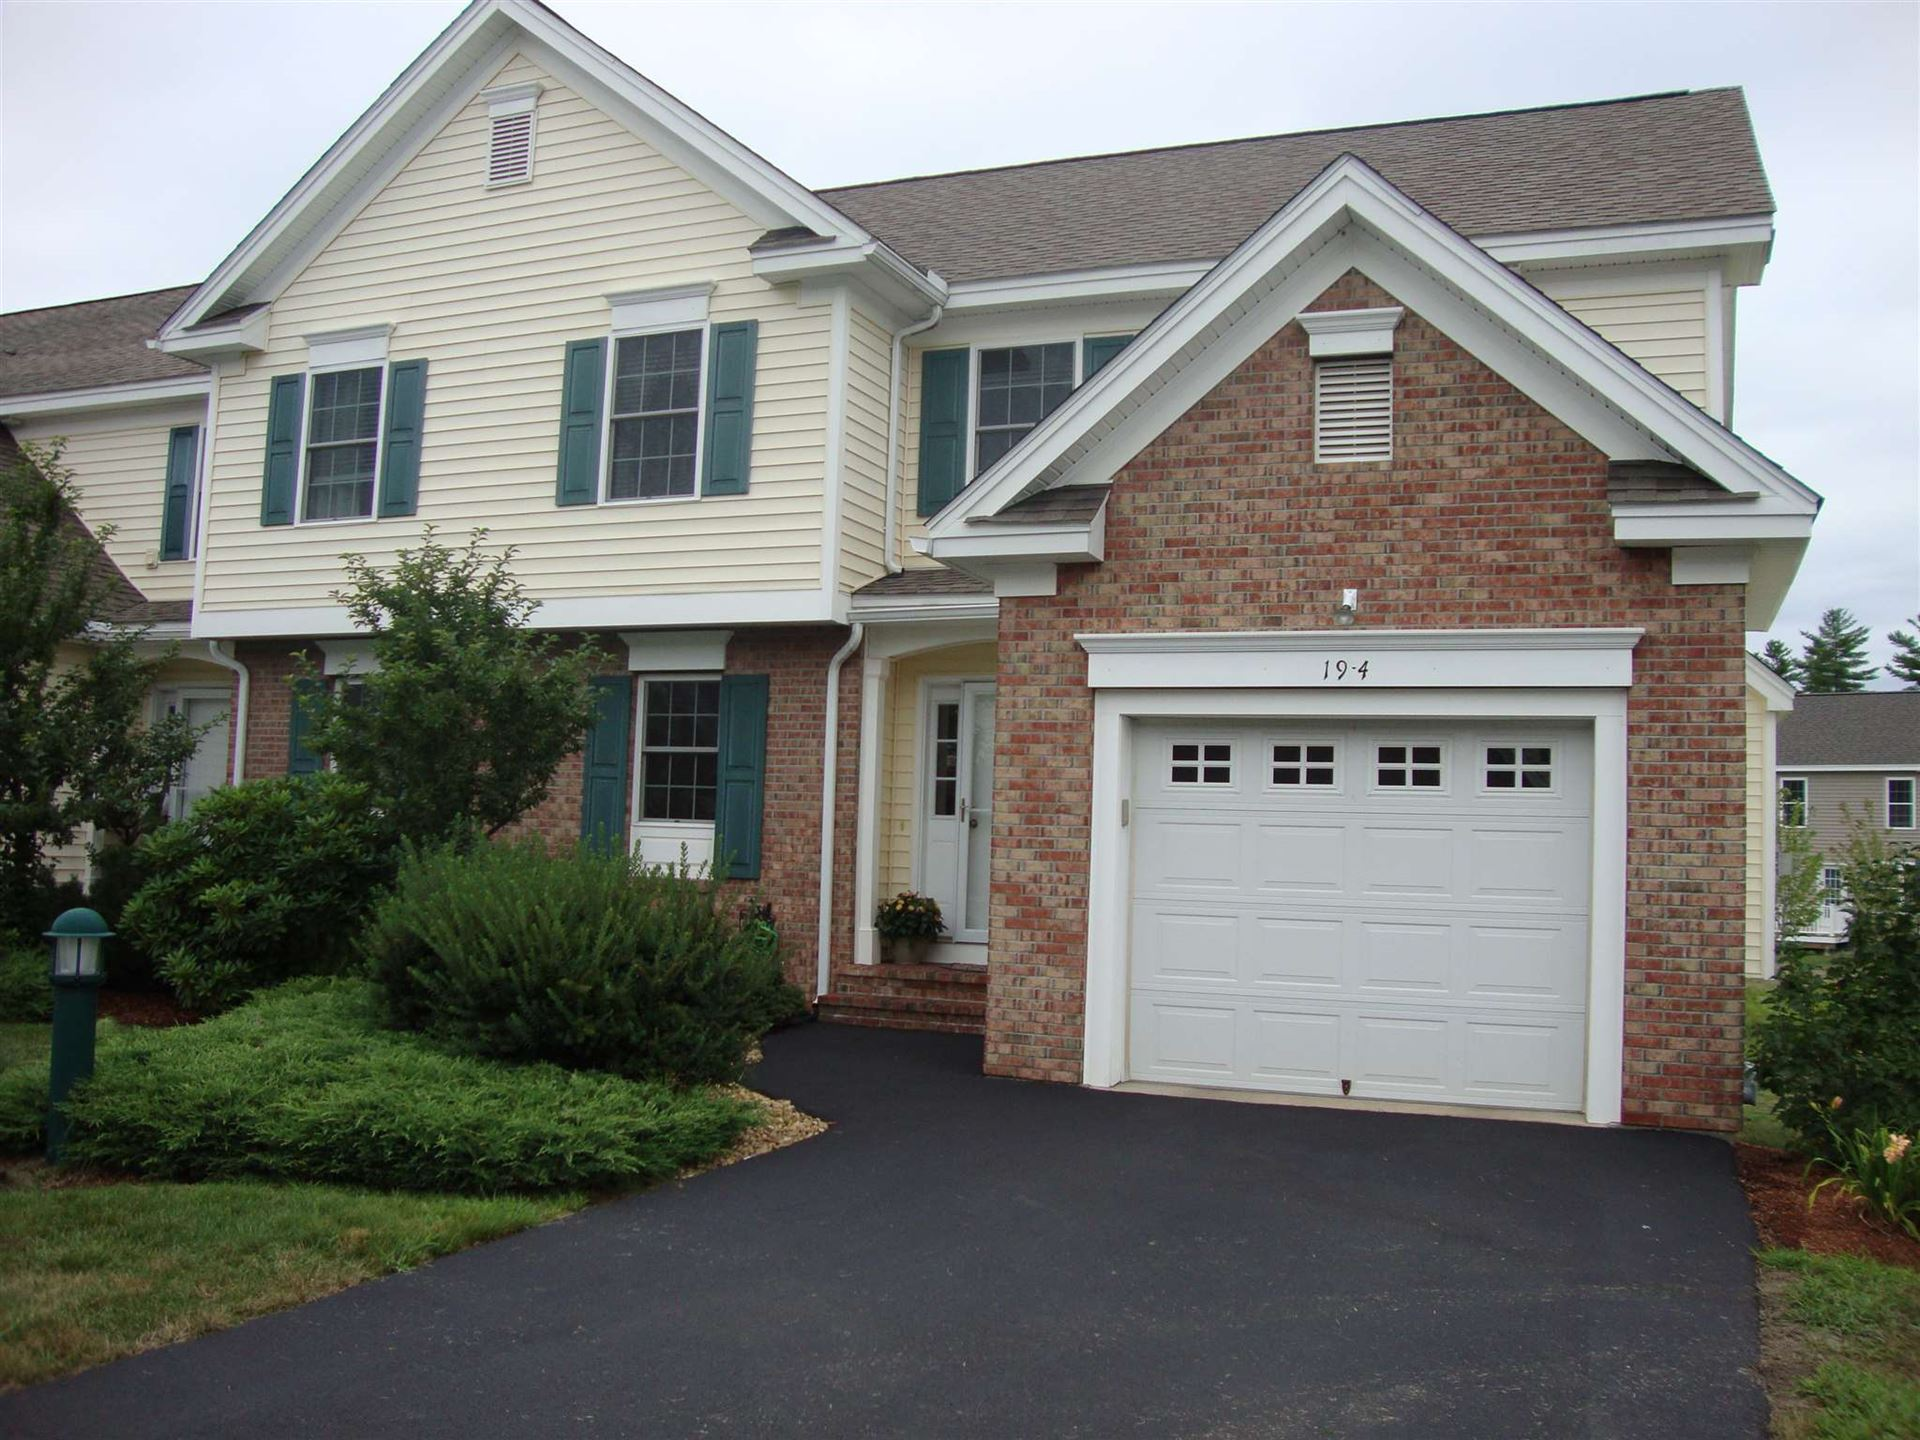 19 Cabernet Drive #4, Concord, NH 03303 - MLS#: 4818090